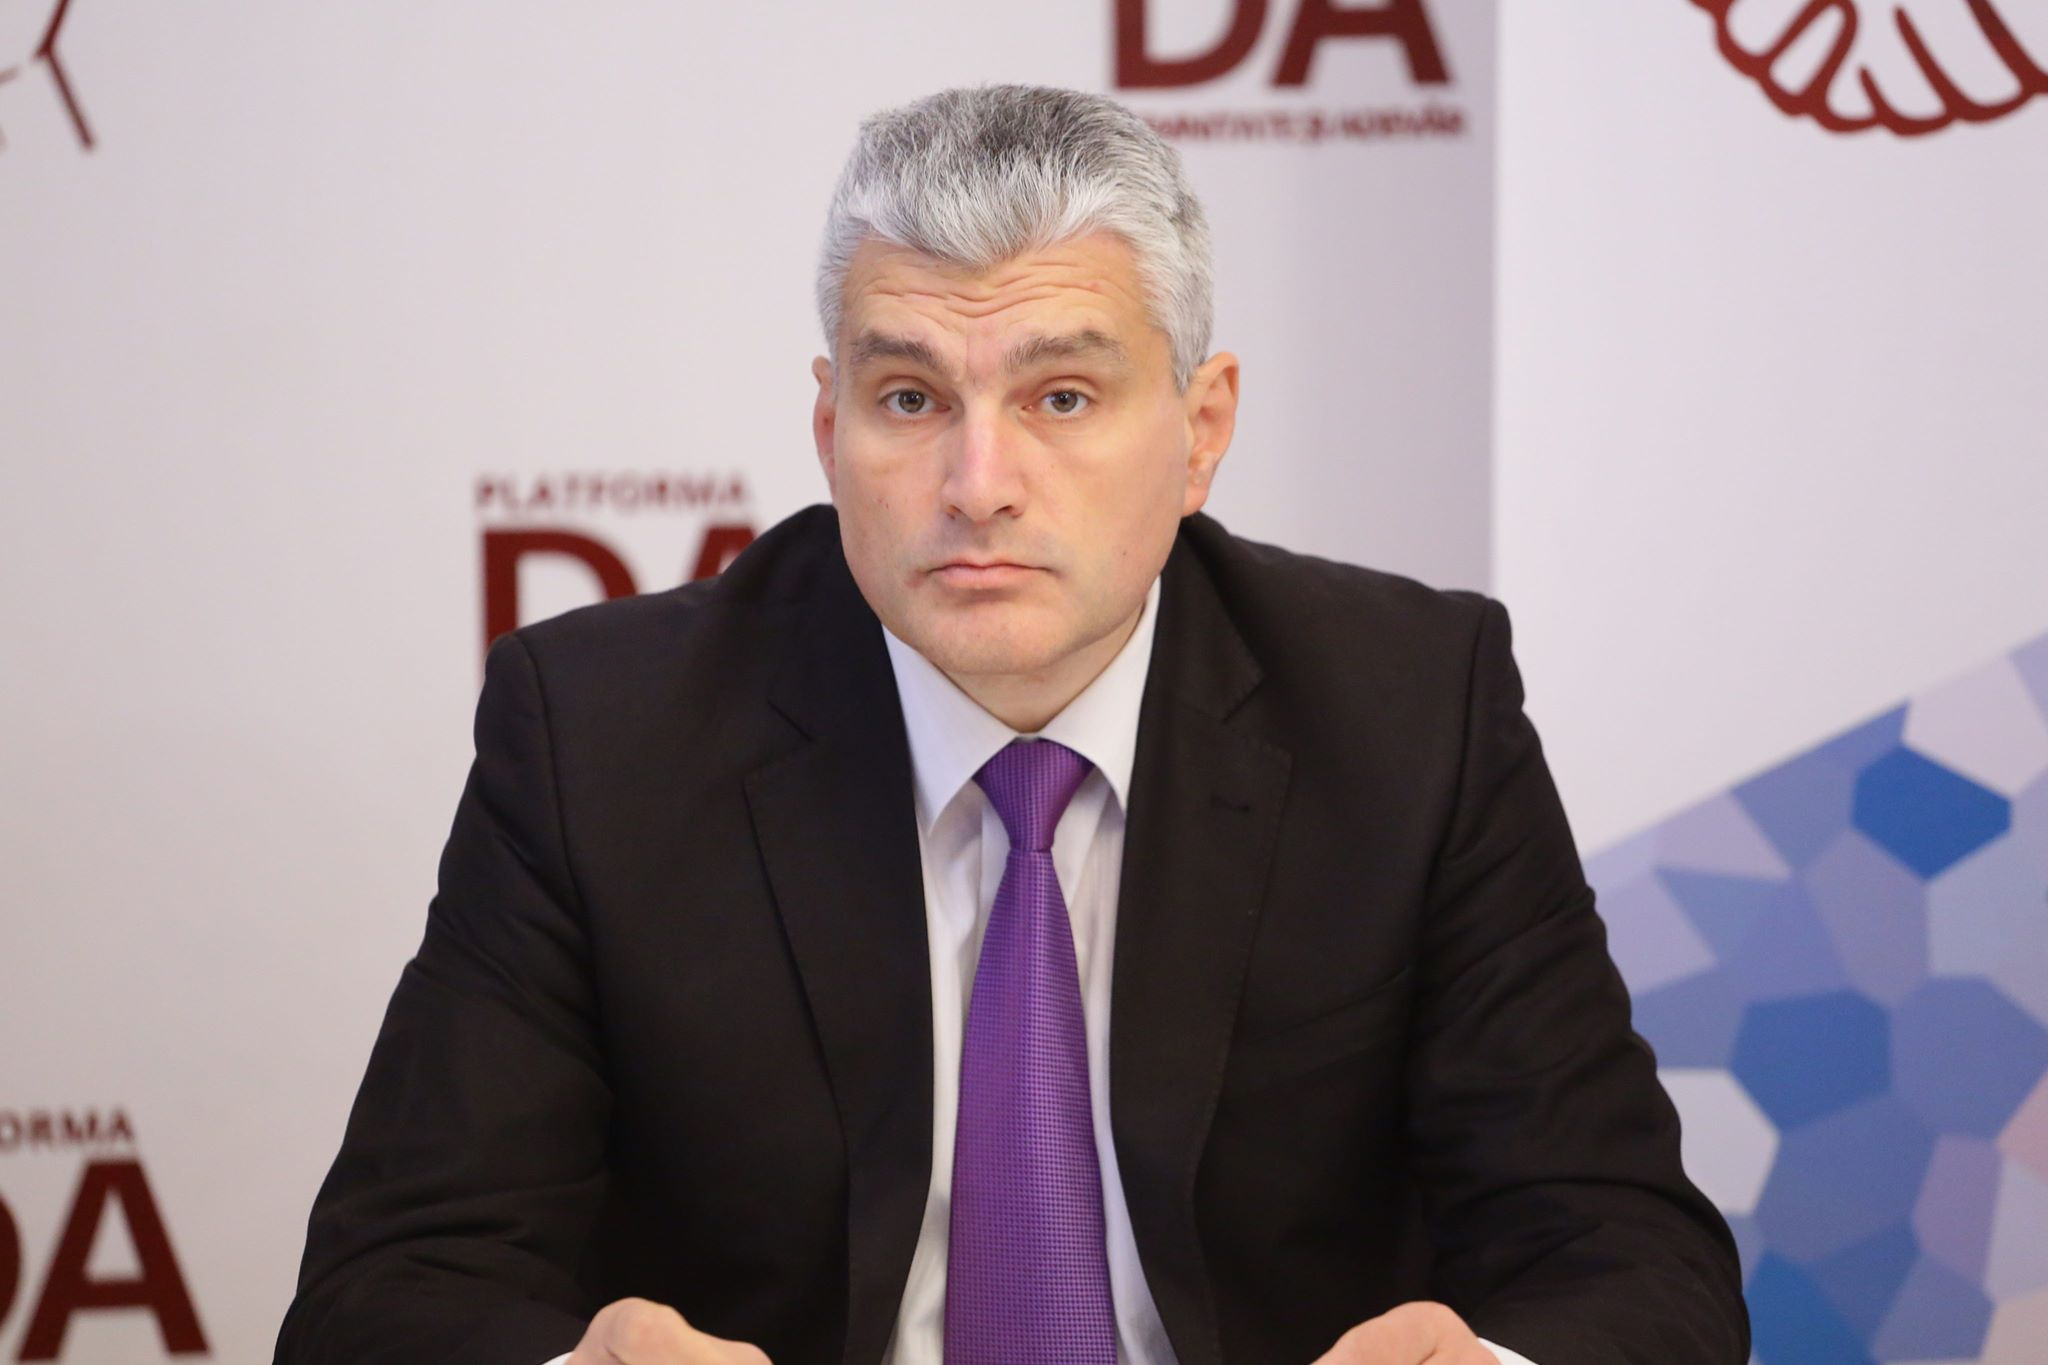 (INTERVIU) Alexandru Slusari: Dezastrul a substituit democrația din Republica Moldova